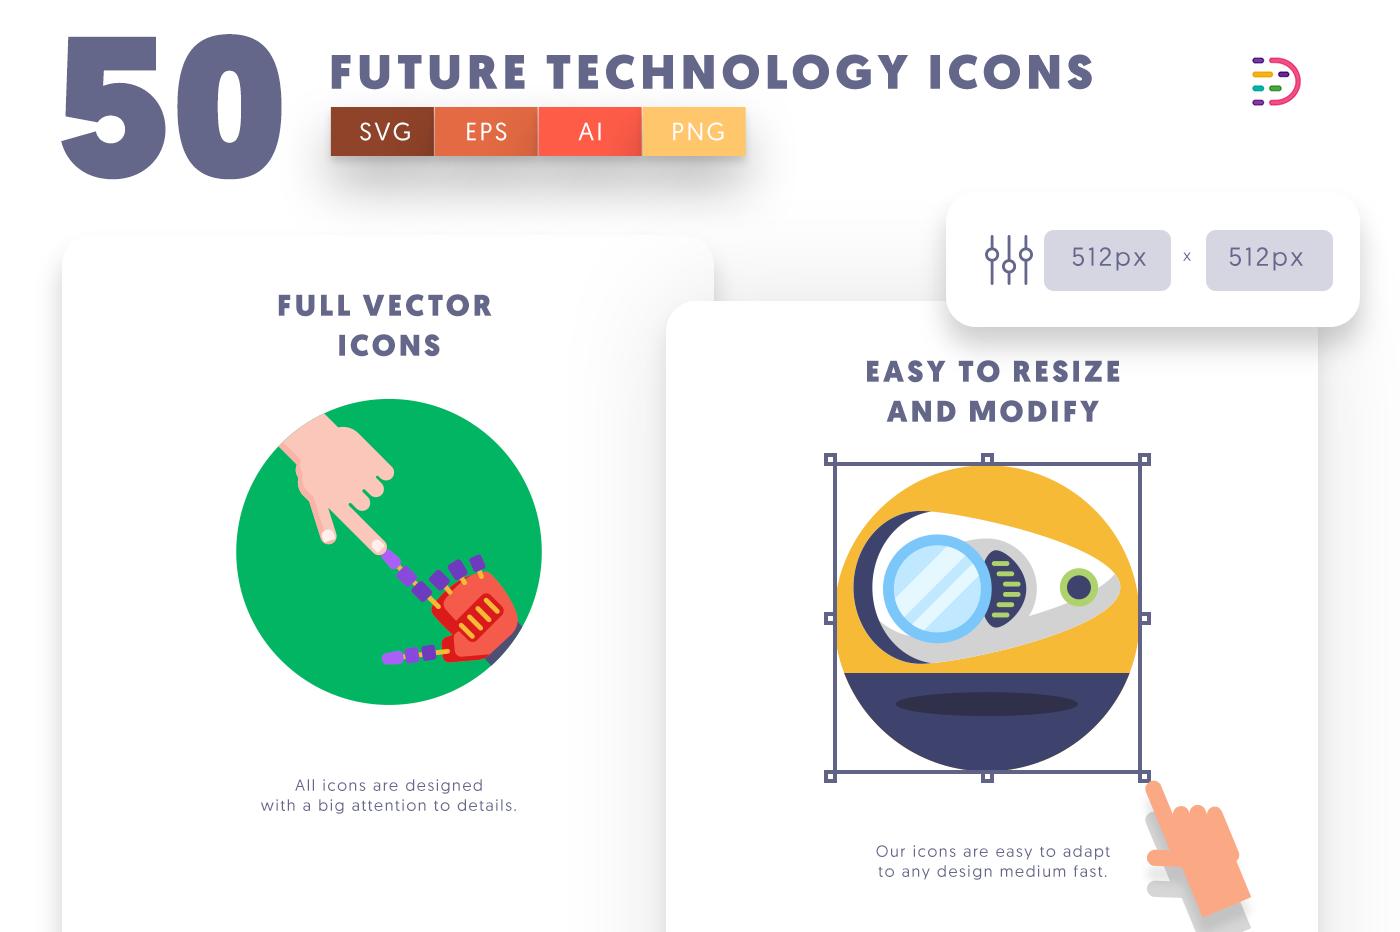 Full vector 50FutureTechnology Icons